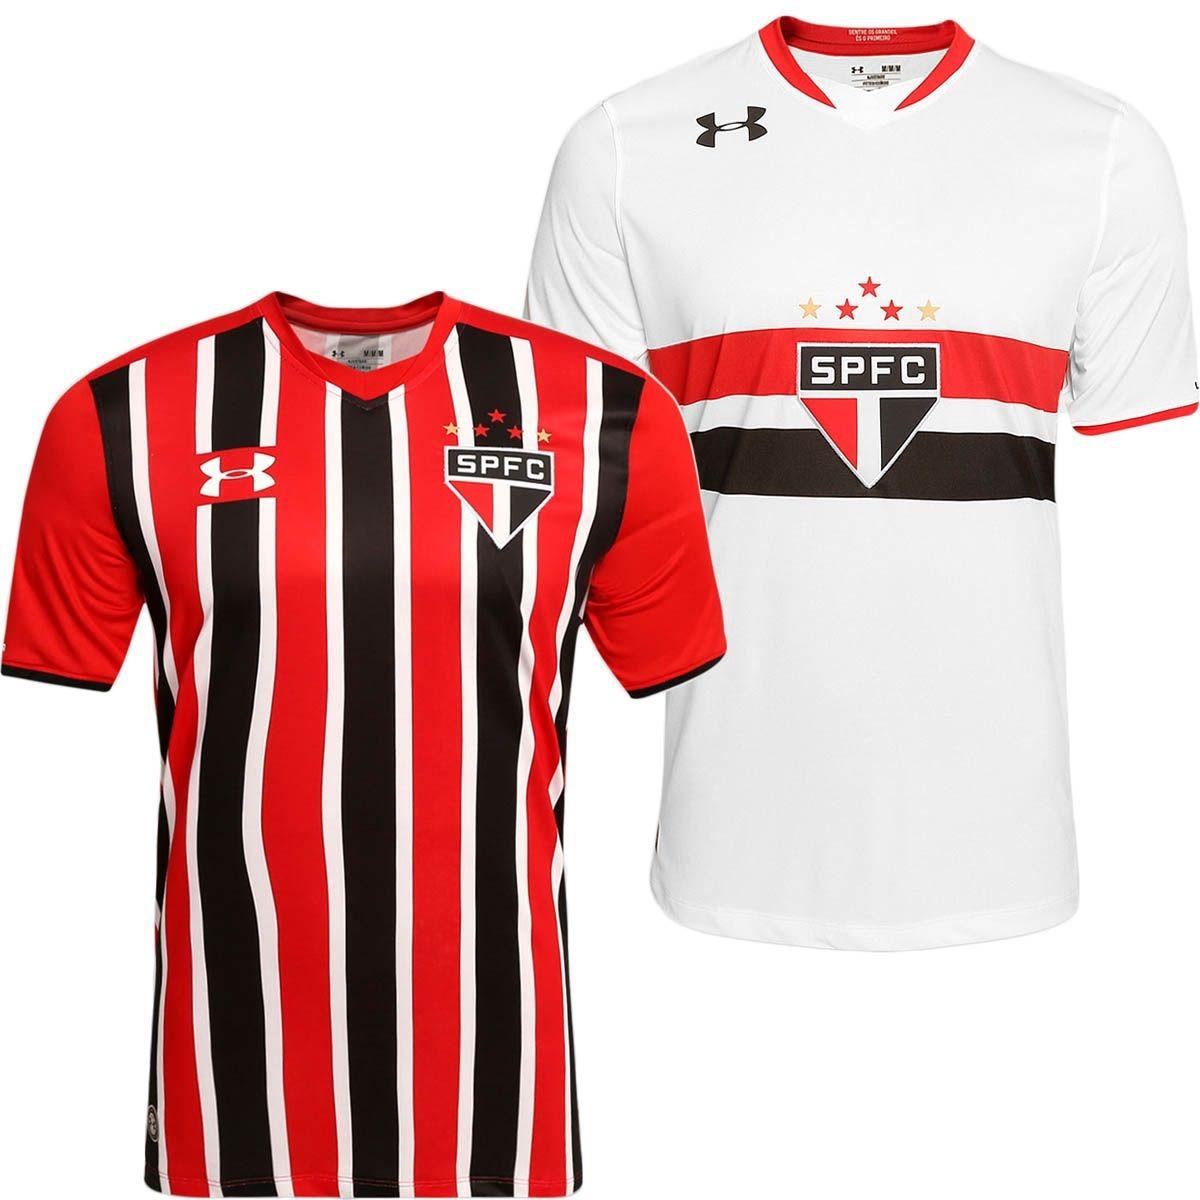 445f1707d46 Kit C  2 Camisas São Paulo Under Armor 1 E 2 15 16 S nº Orig - R ...